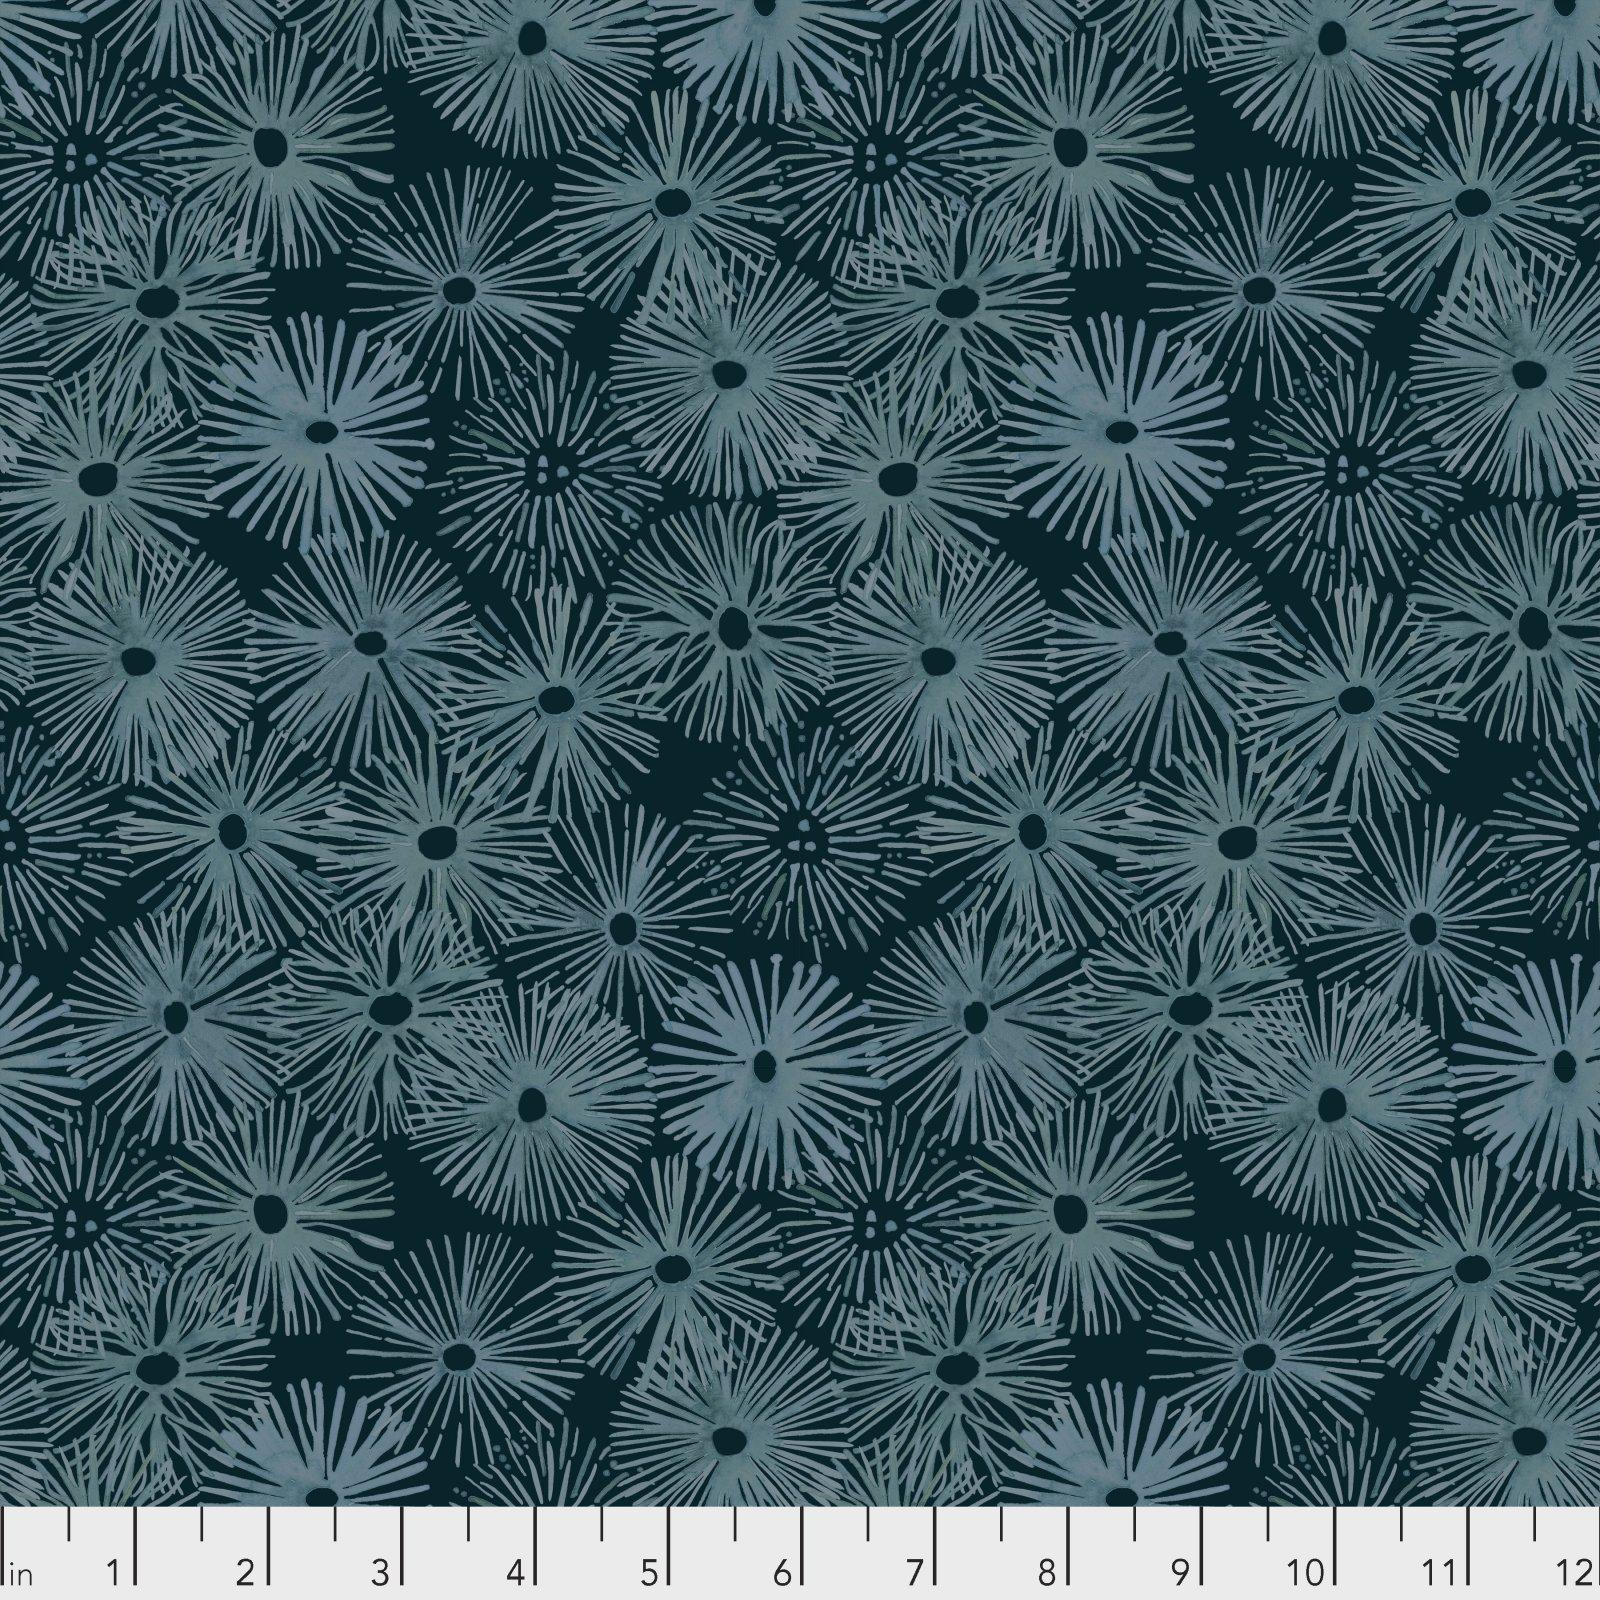 Time & Tide by Shell Rummel for Free Spirit Fabrics - Urchin - Depths